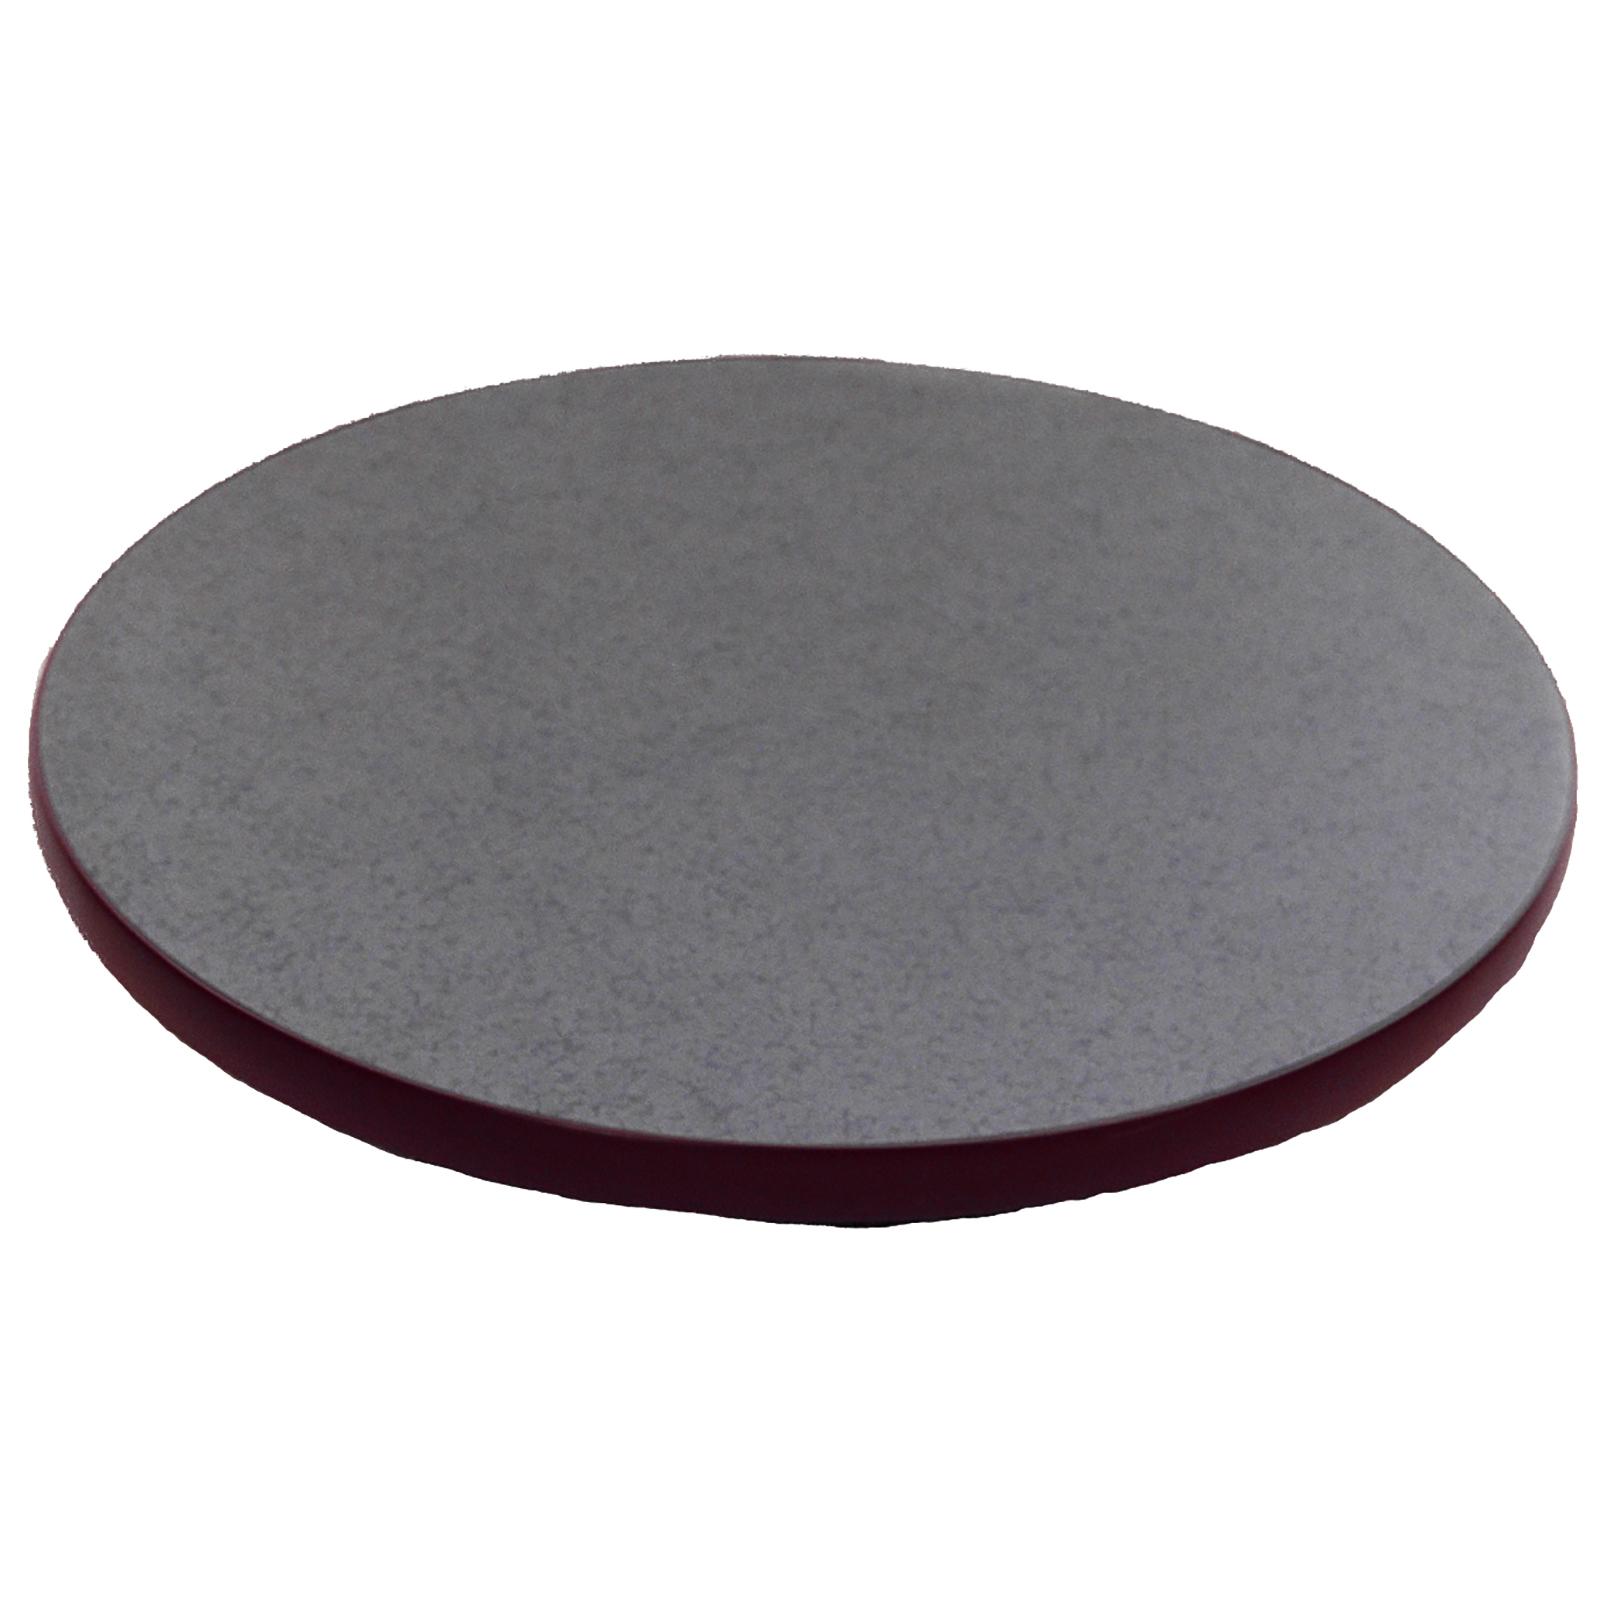 Oak Street CTM3096-2 table top, laminate